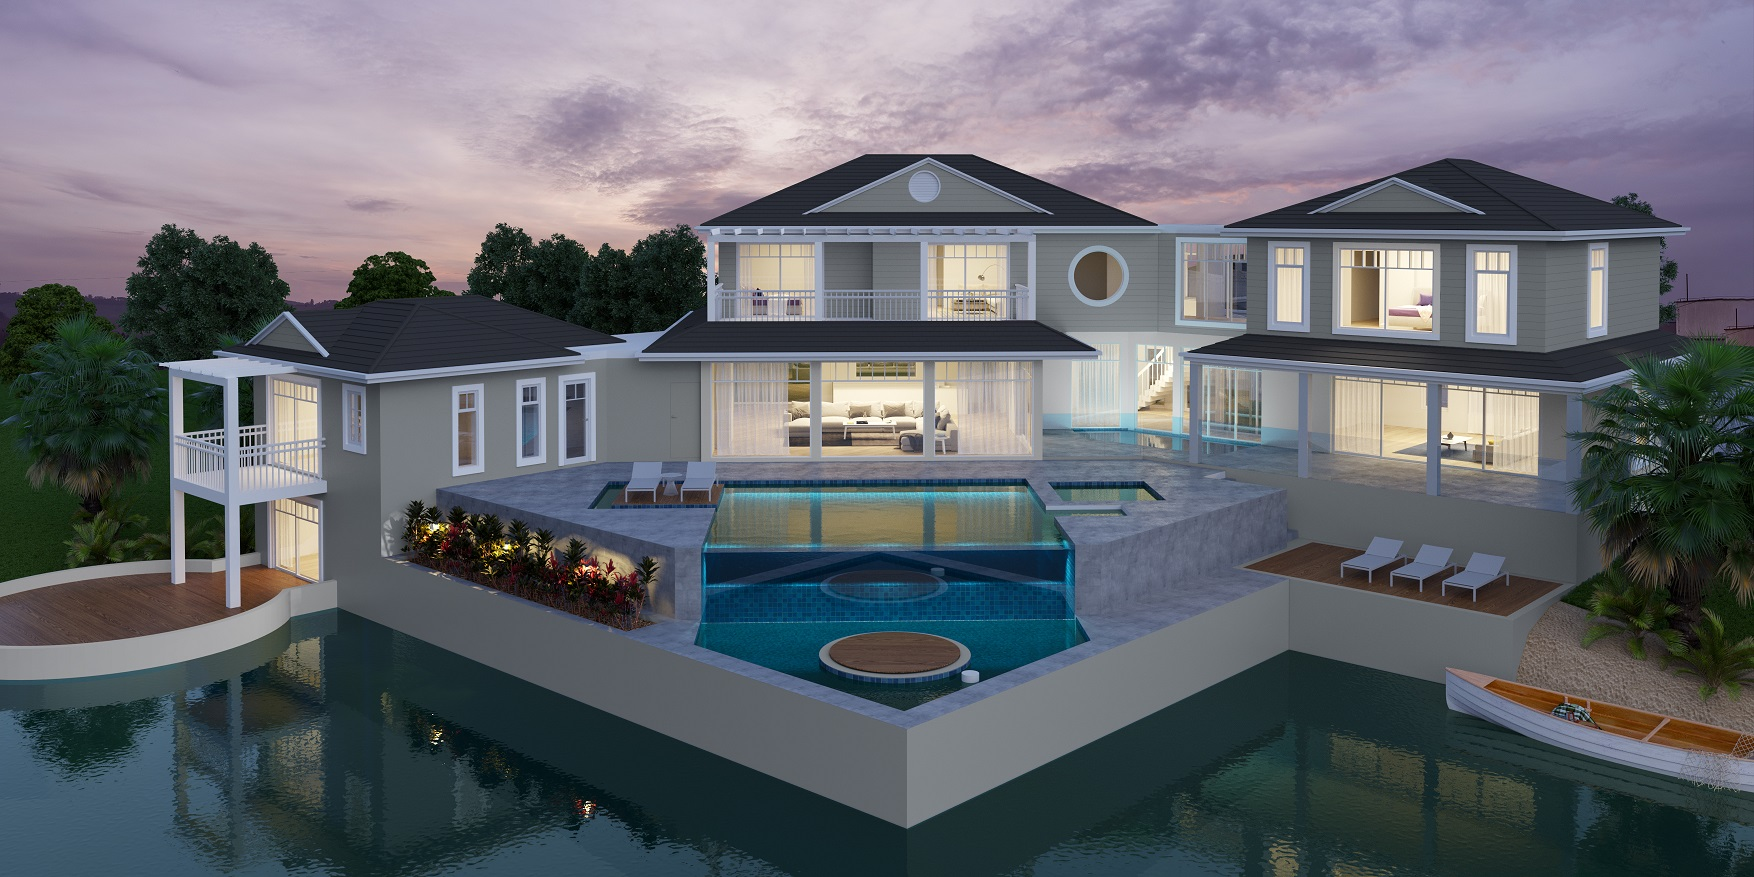 Custom House Design Hampton House Pool 2 Story